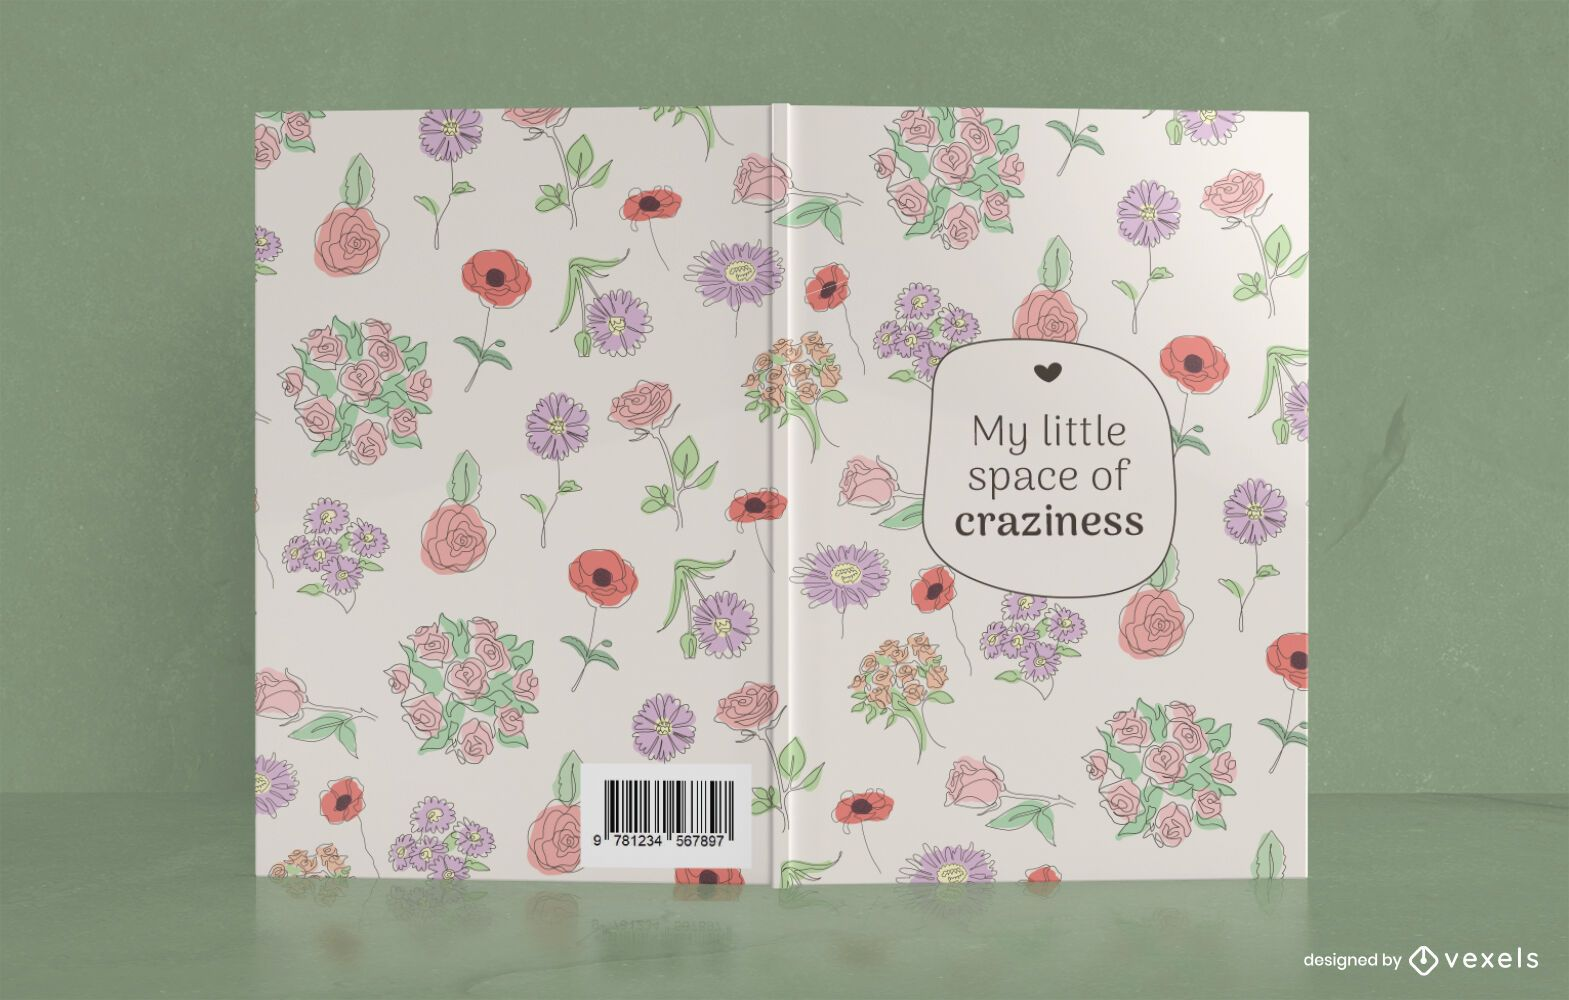 Diseño de portada de libro Floral Space of Craziness